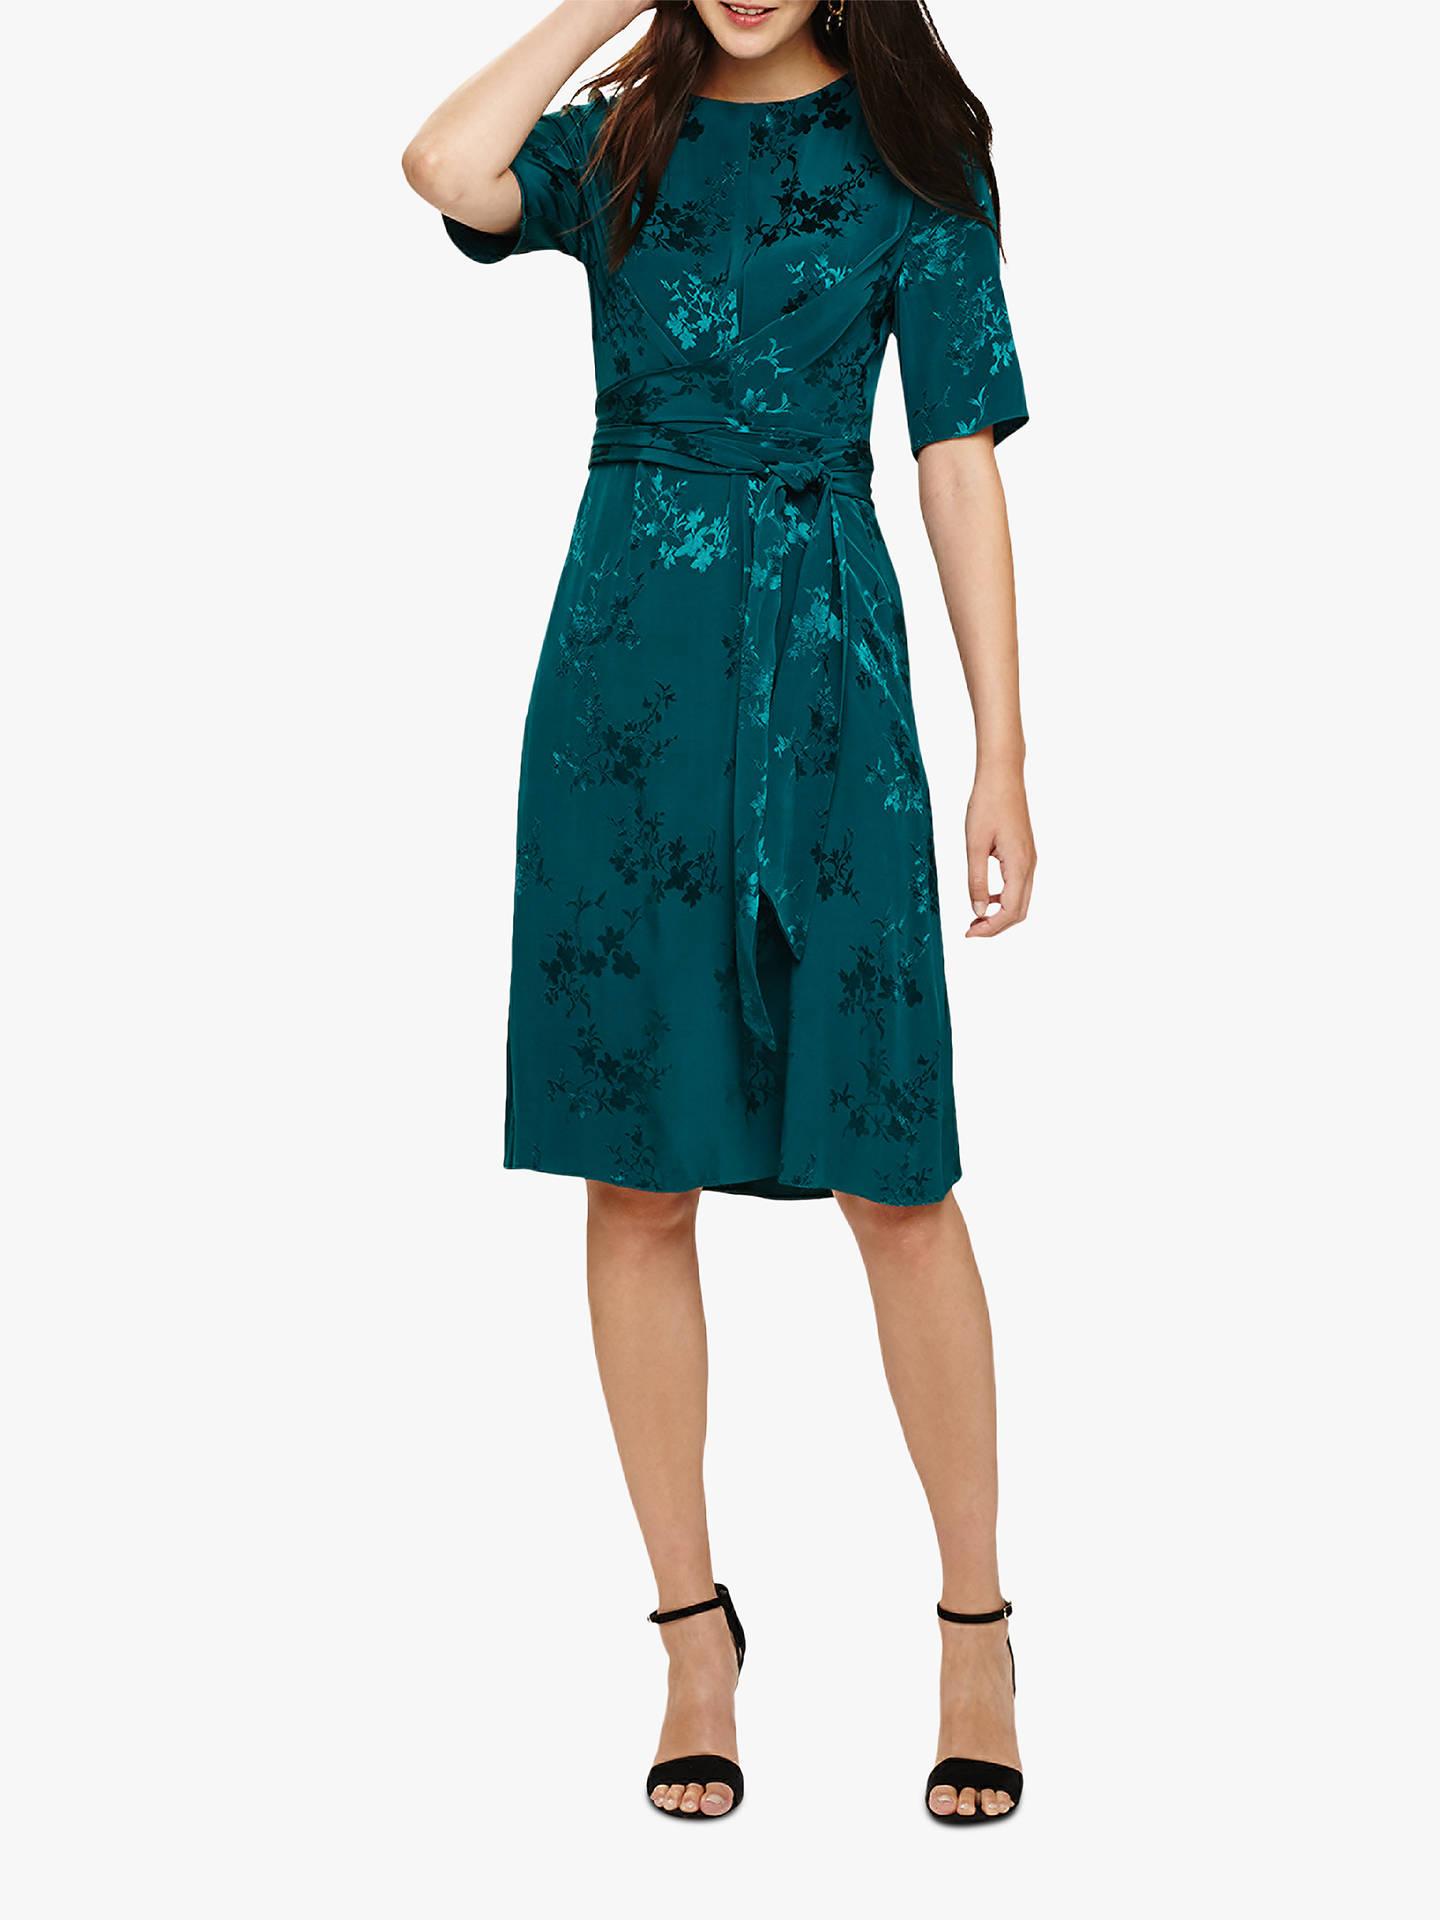 ac8f7062f0 BuyPhase Eight Jaimee Jacquard Dress